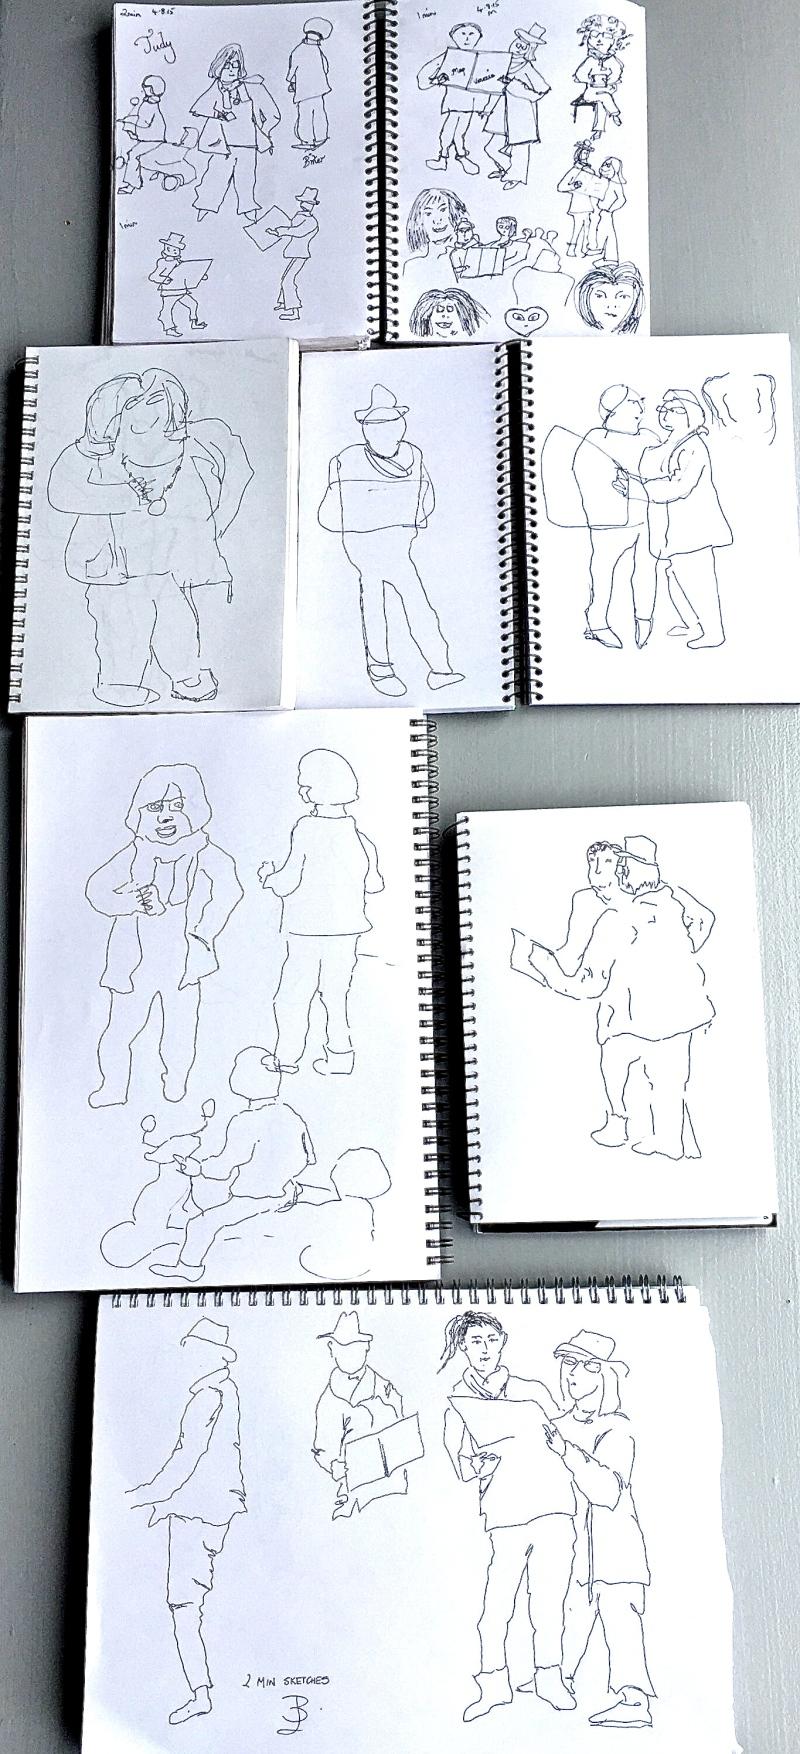 Tuesday. Contour sketching